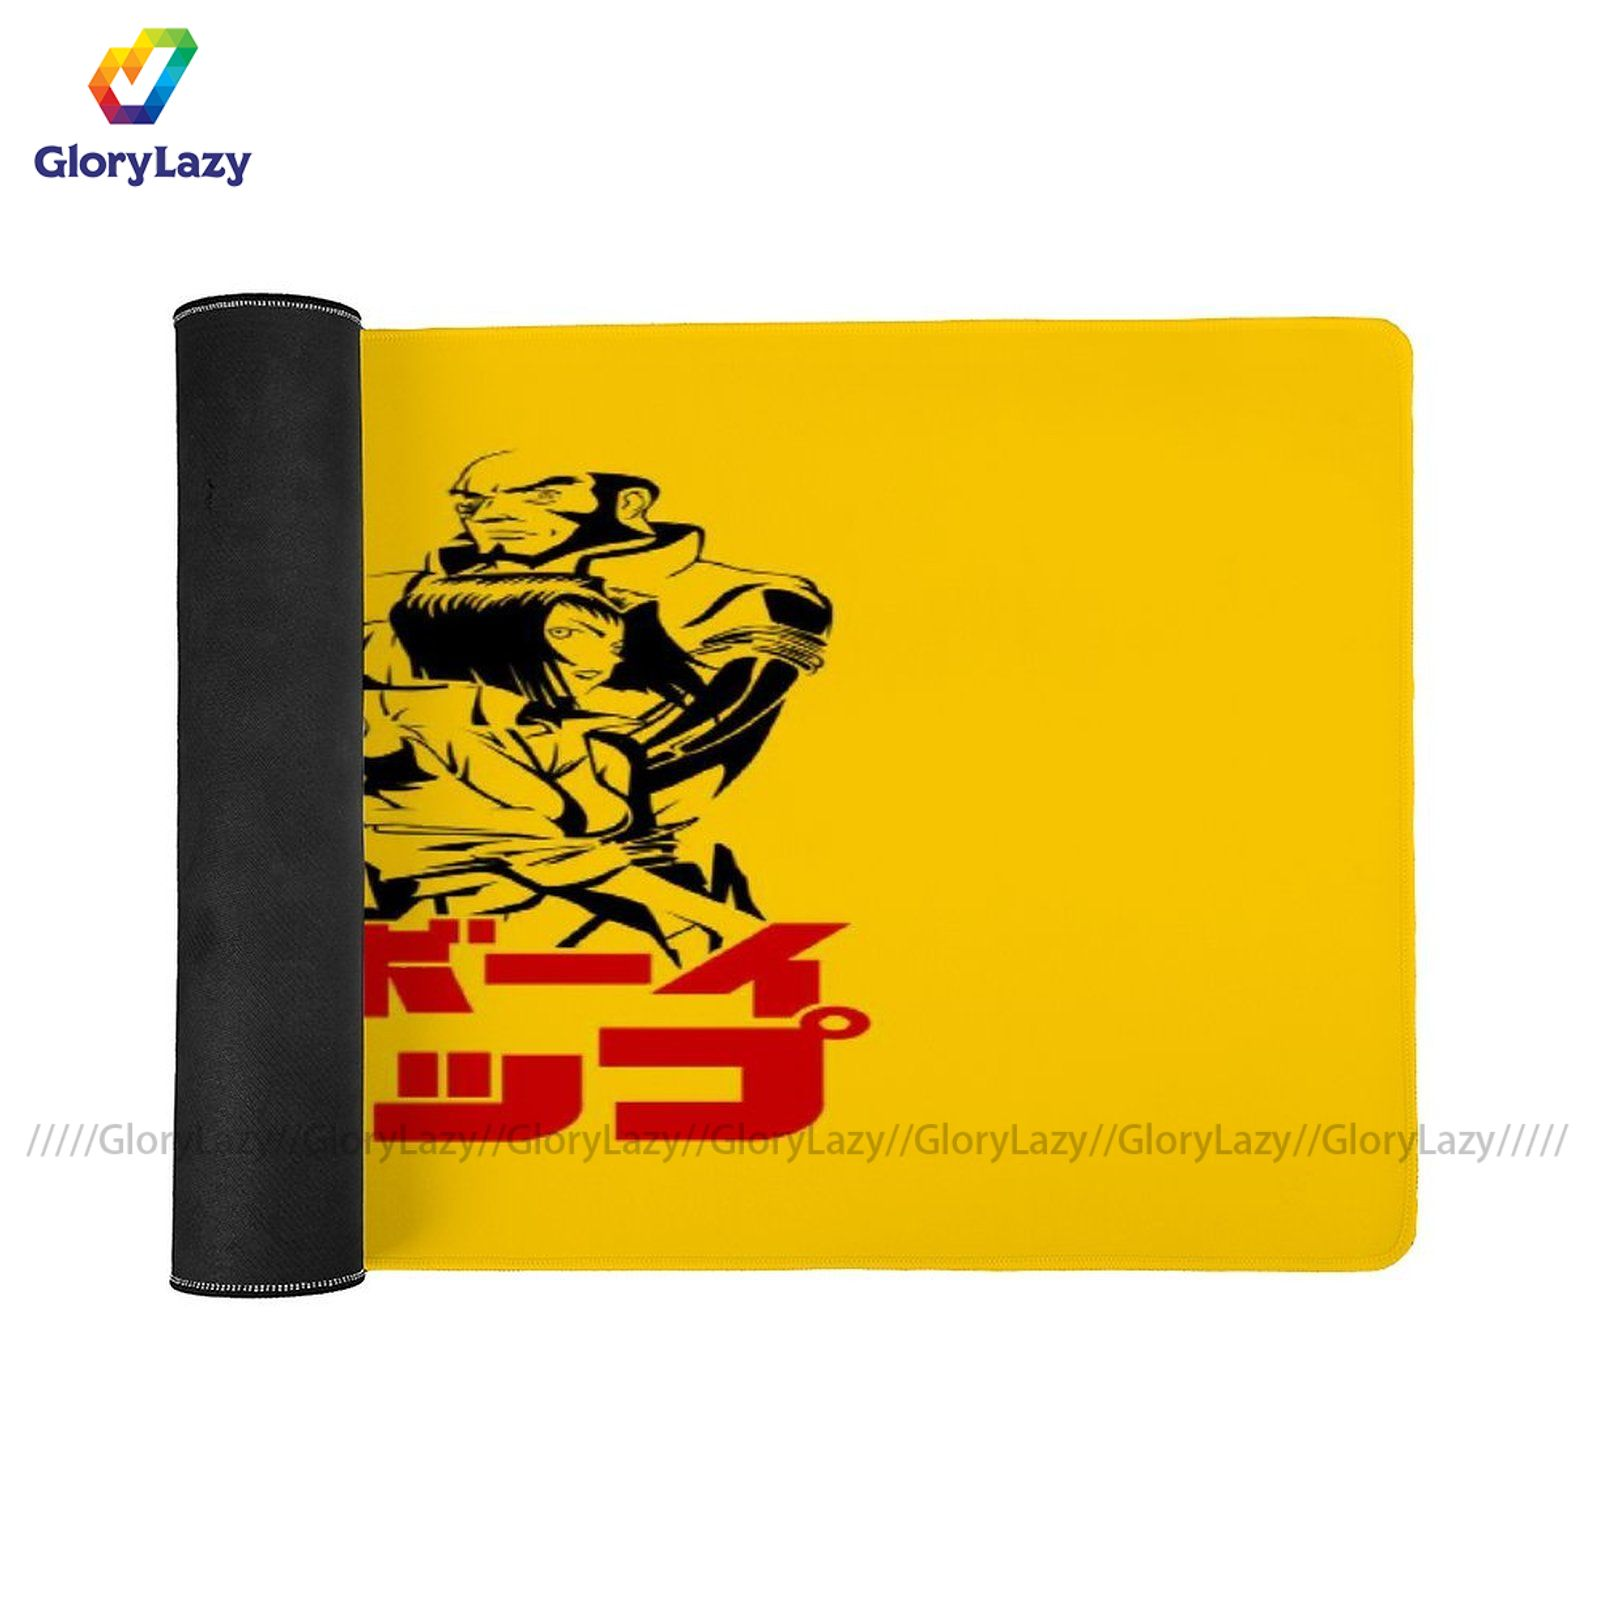 H0694e0706e714948a2425519225f46feW - Anime Mousepads